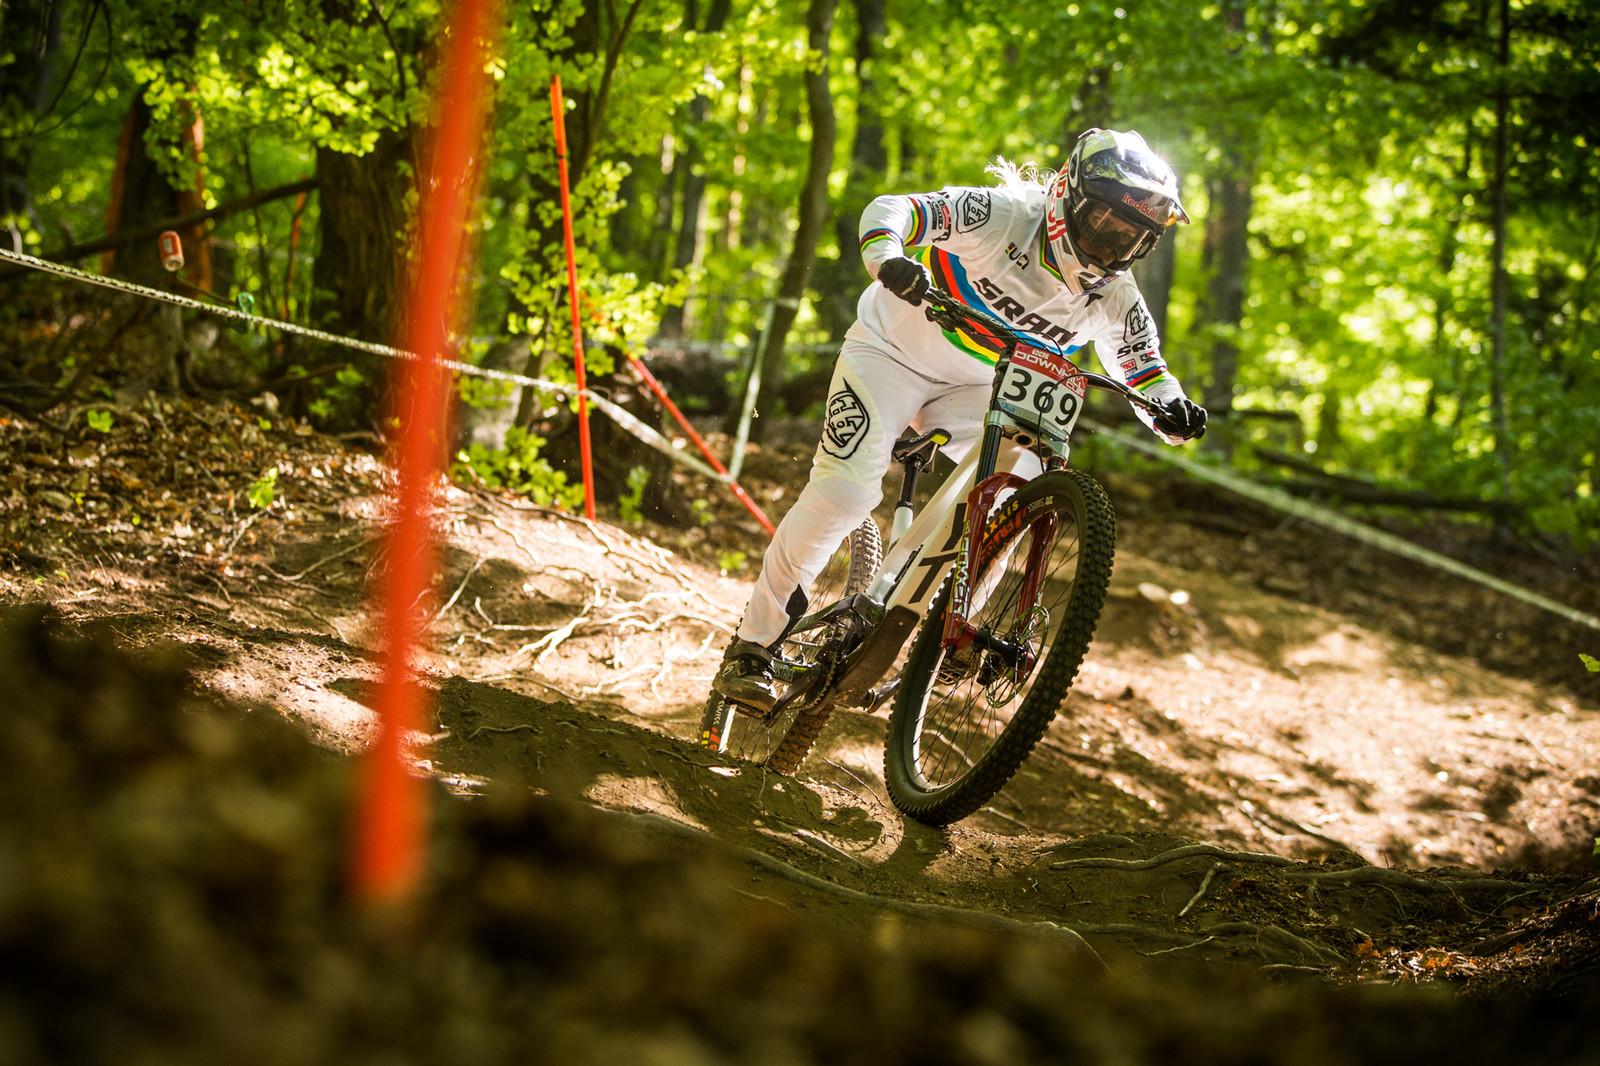 Vali Holl - iXS Downhill Cup Maribor - Race Gallery - Mountain Biking Pictures - Vital MTB